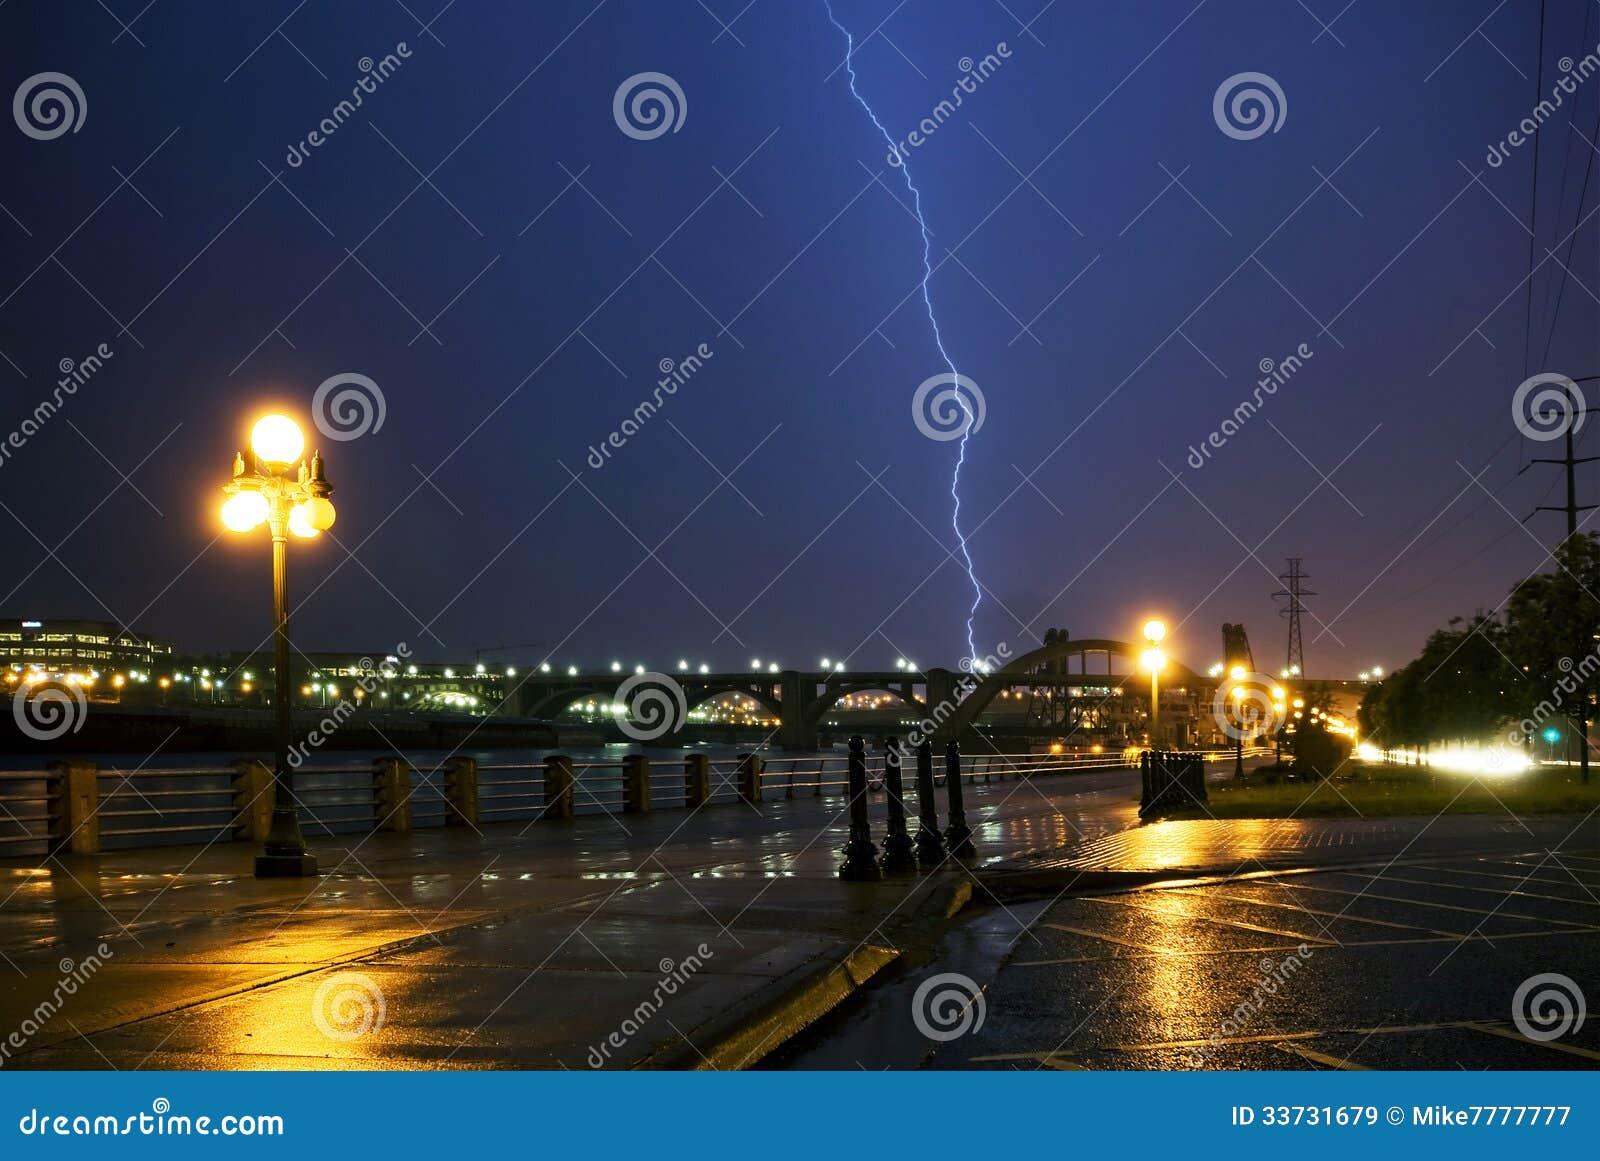 Fulmine sopra il fiume Mississippi ed i ponti, del centro. Saint Paul, Minnesota